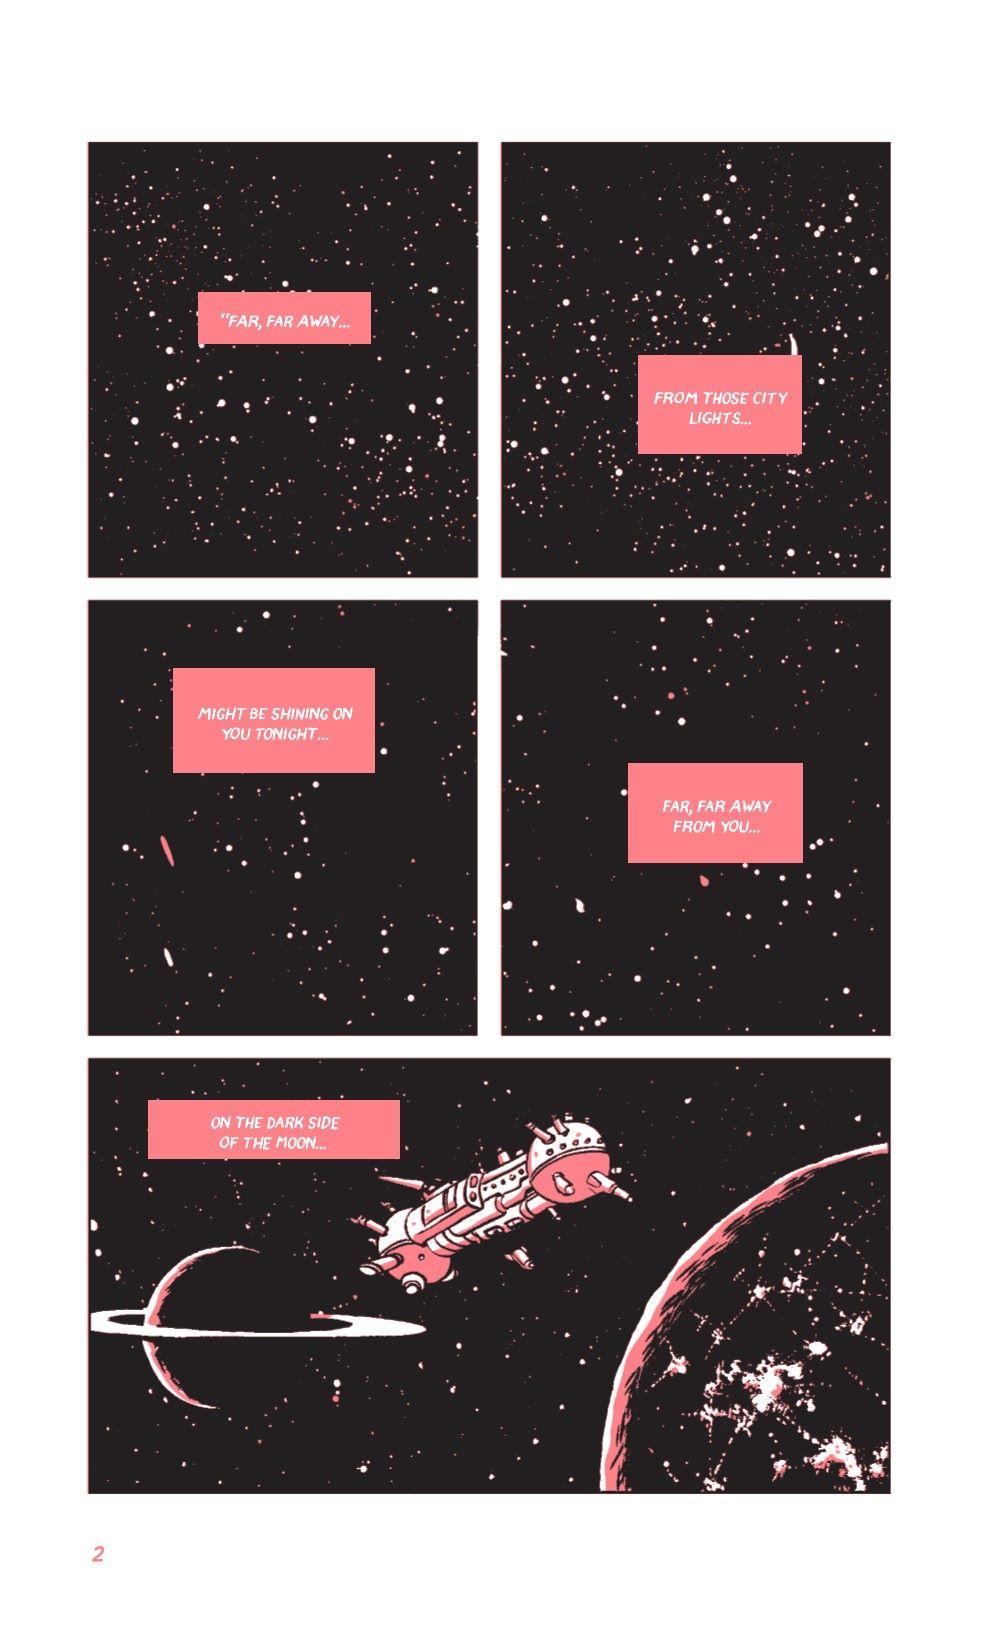 TITAN-REFERENCE-009 ComicList Previews: TITAN GN